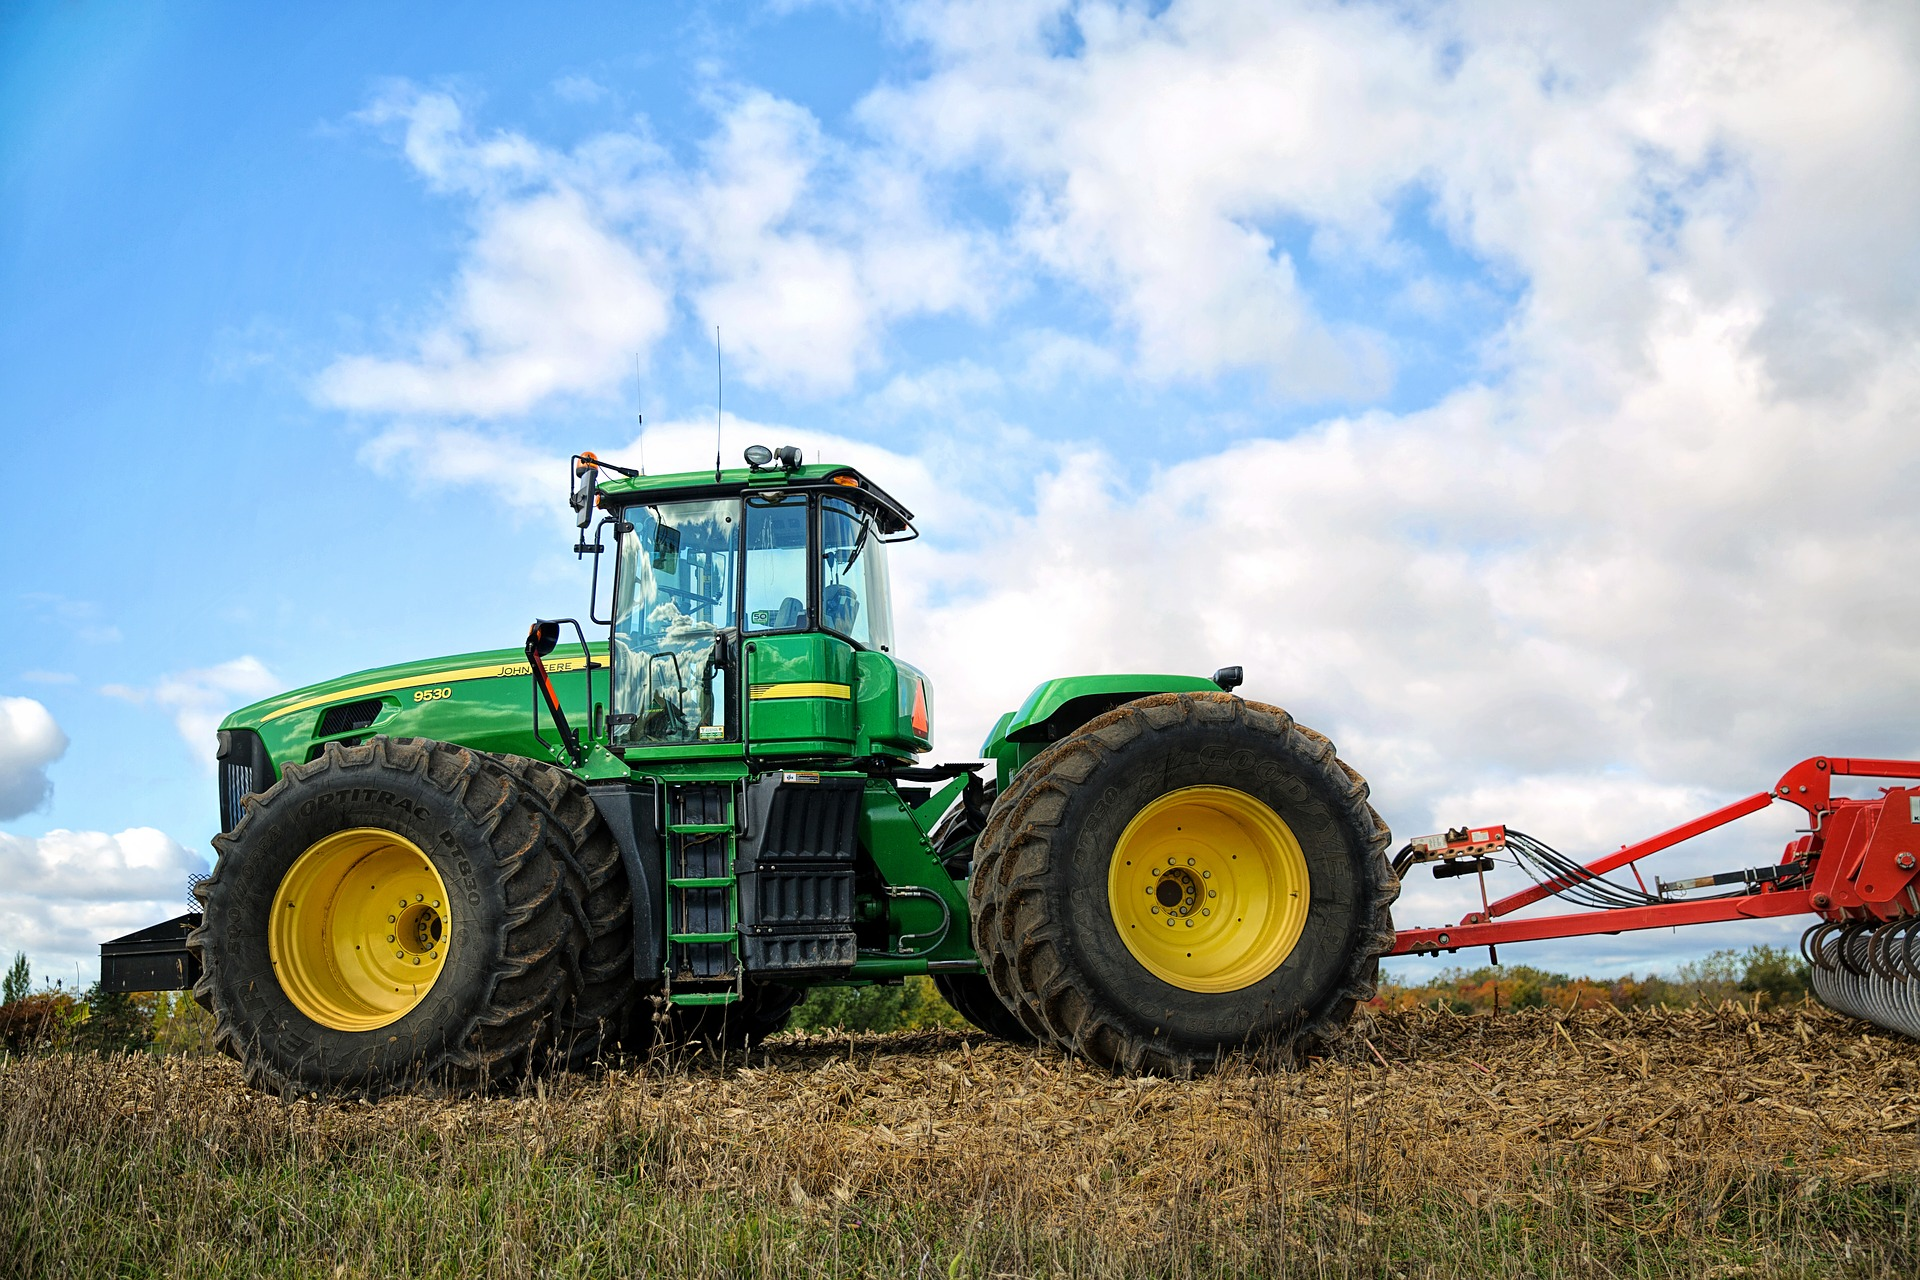 green tractor hauling red farm equipment